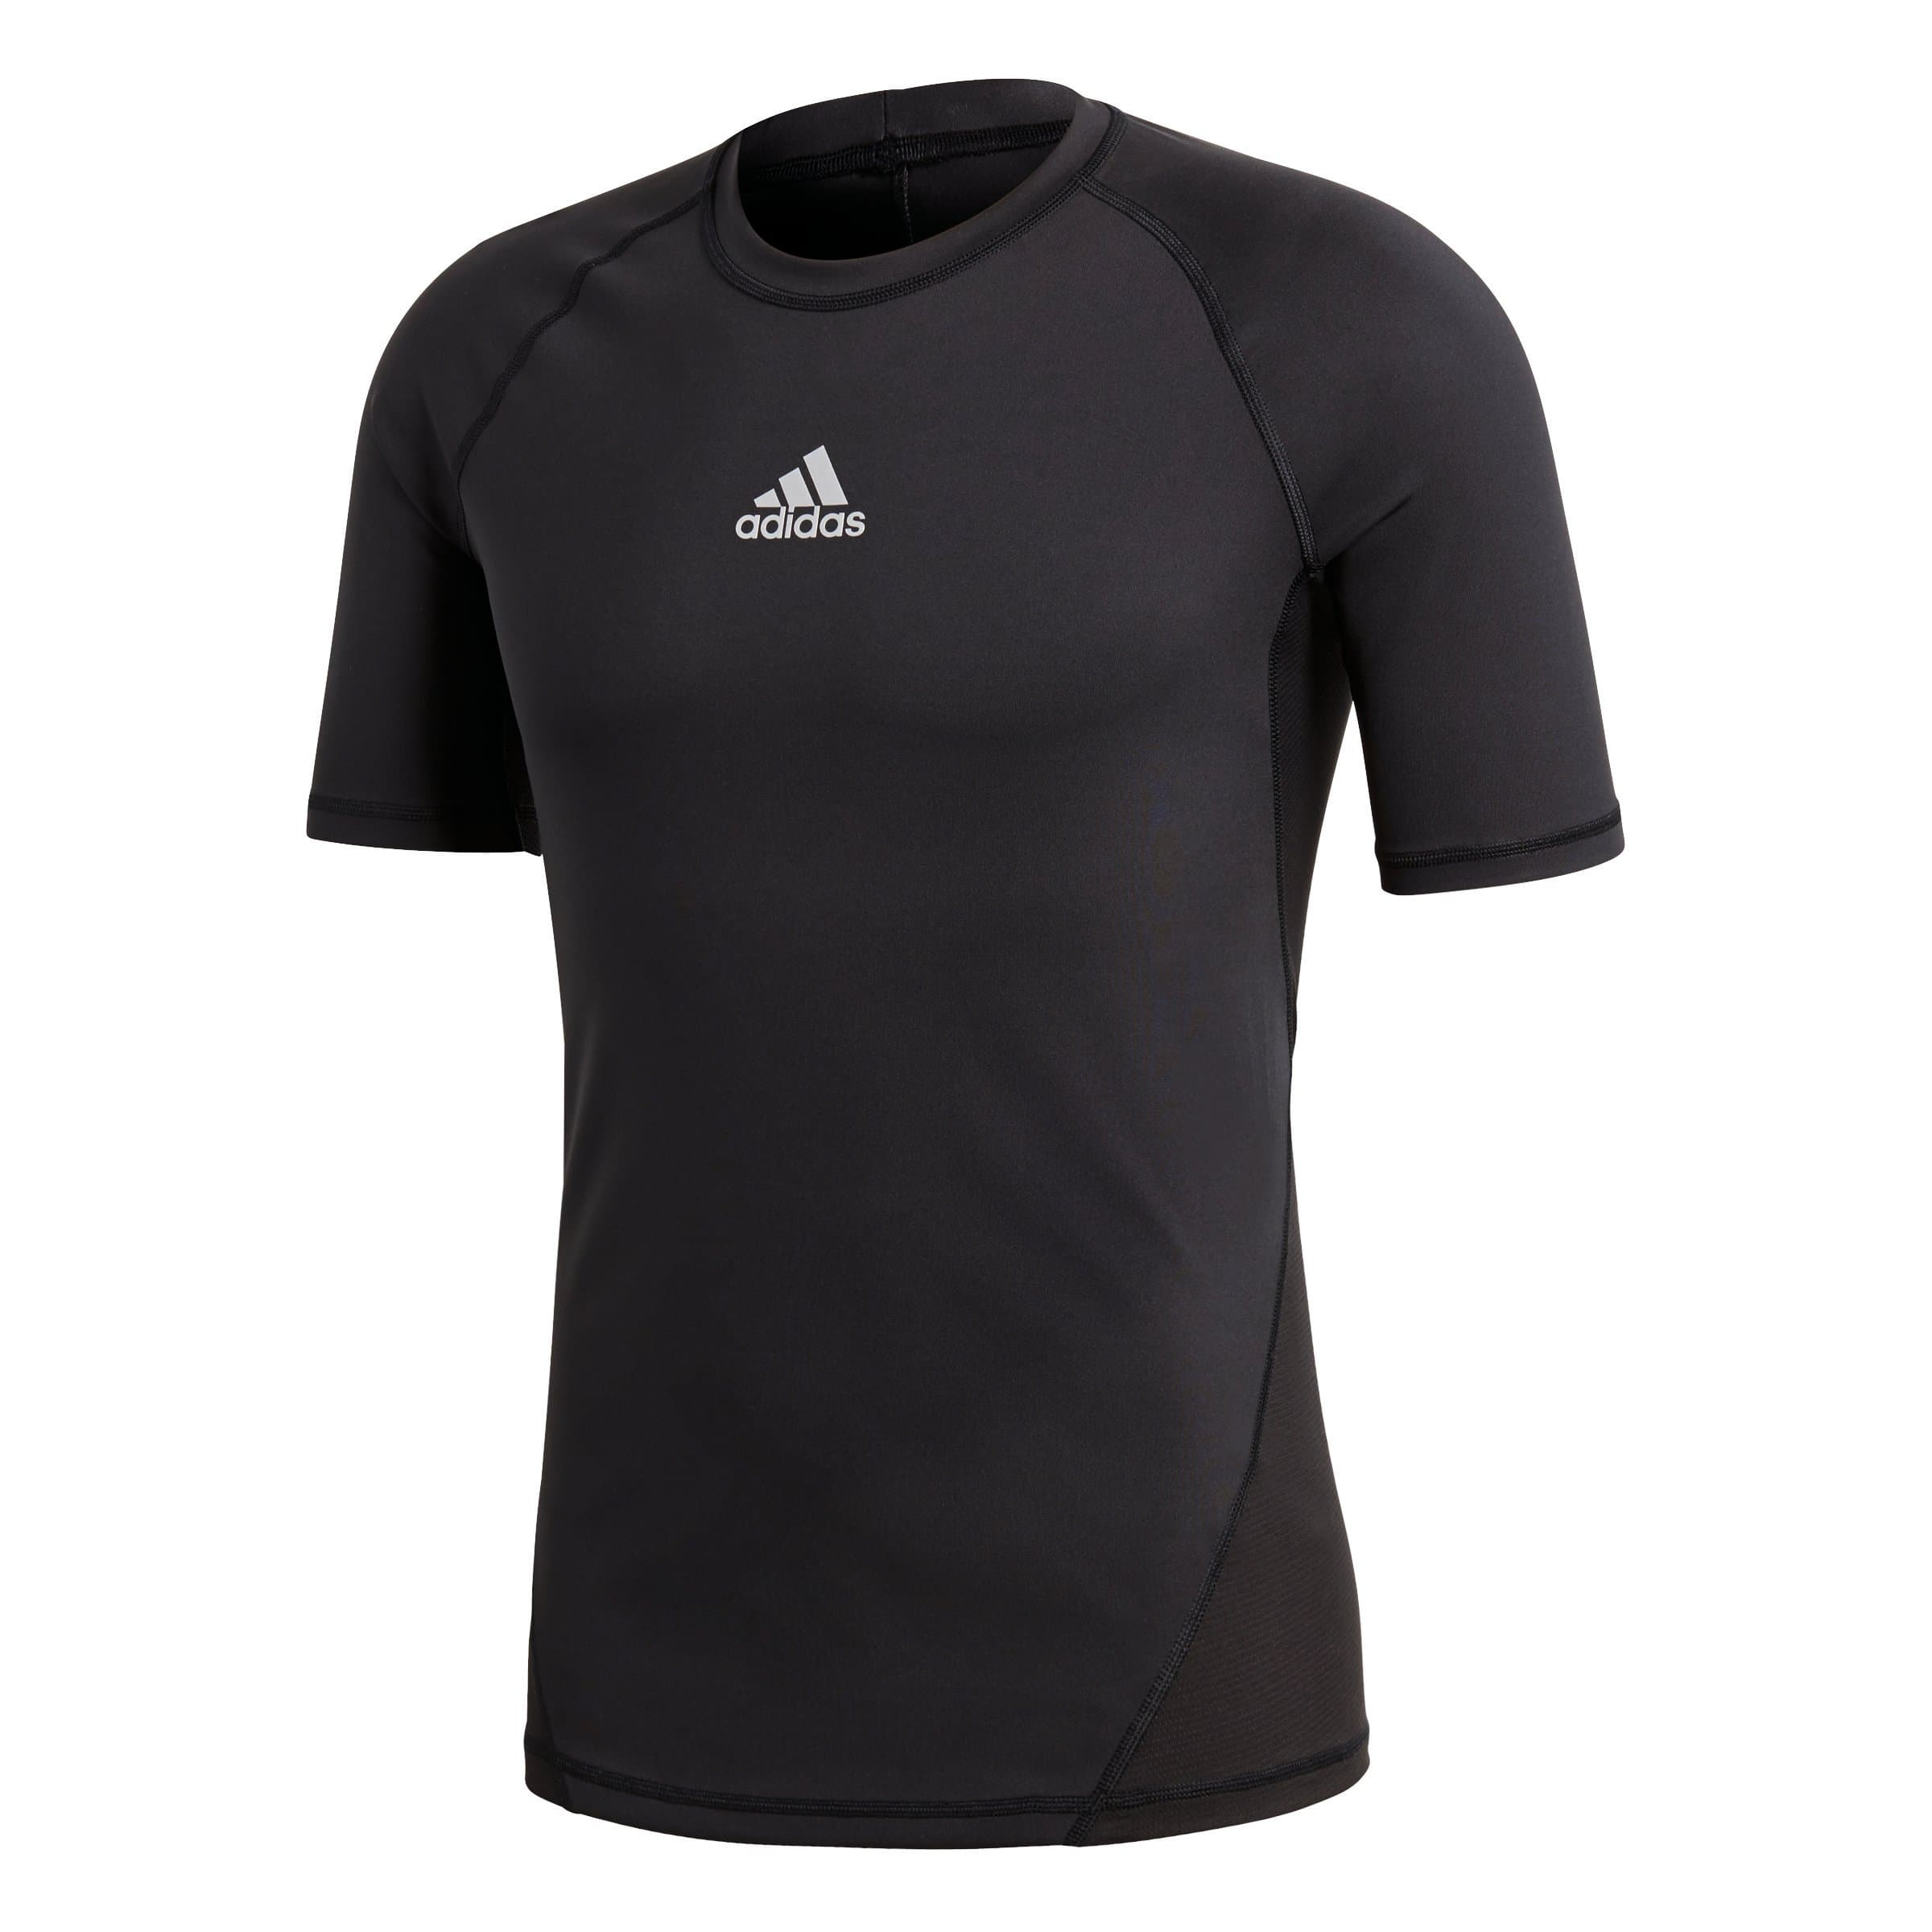 Adidas Ask Sport Shorsleeve Tee Shirt de football pour homme